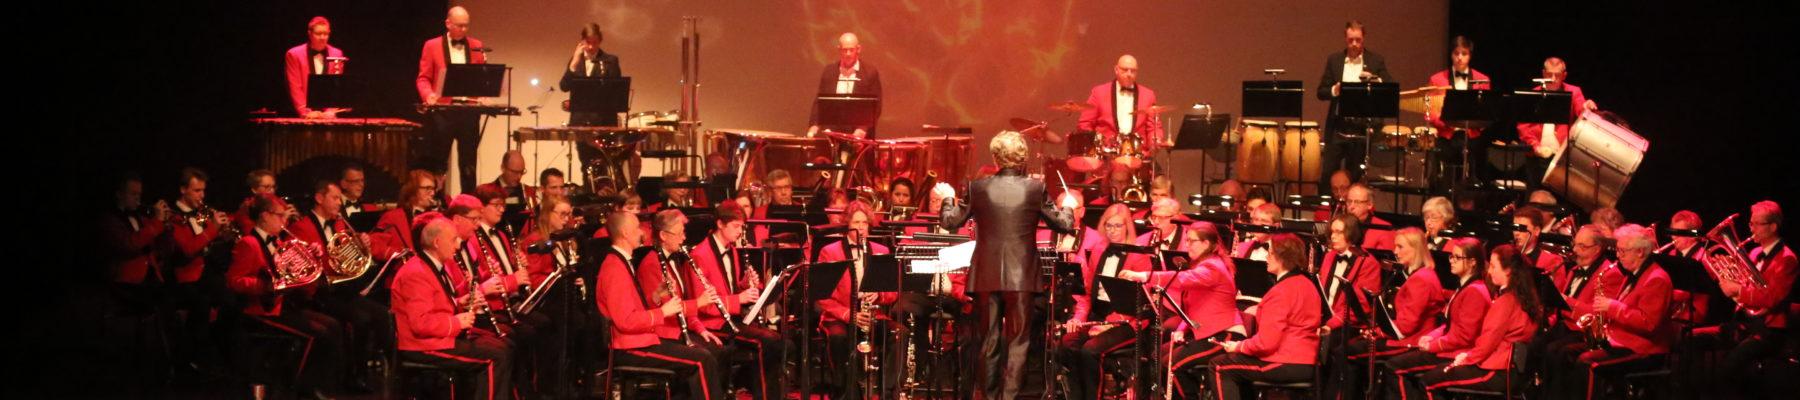 Gouda's Harmonie 'De Pionier'